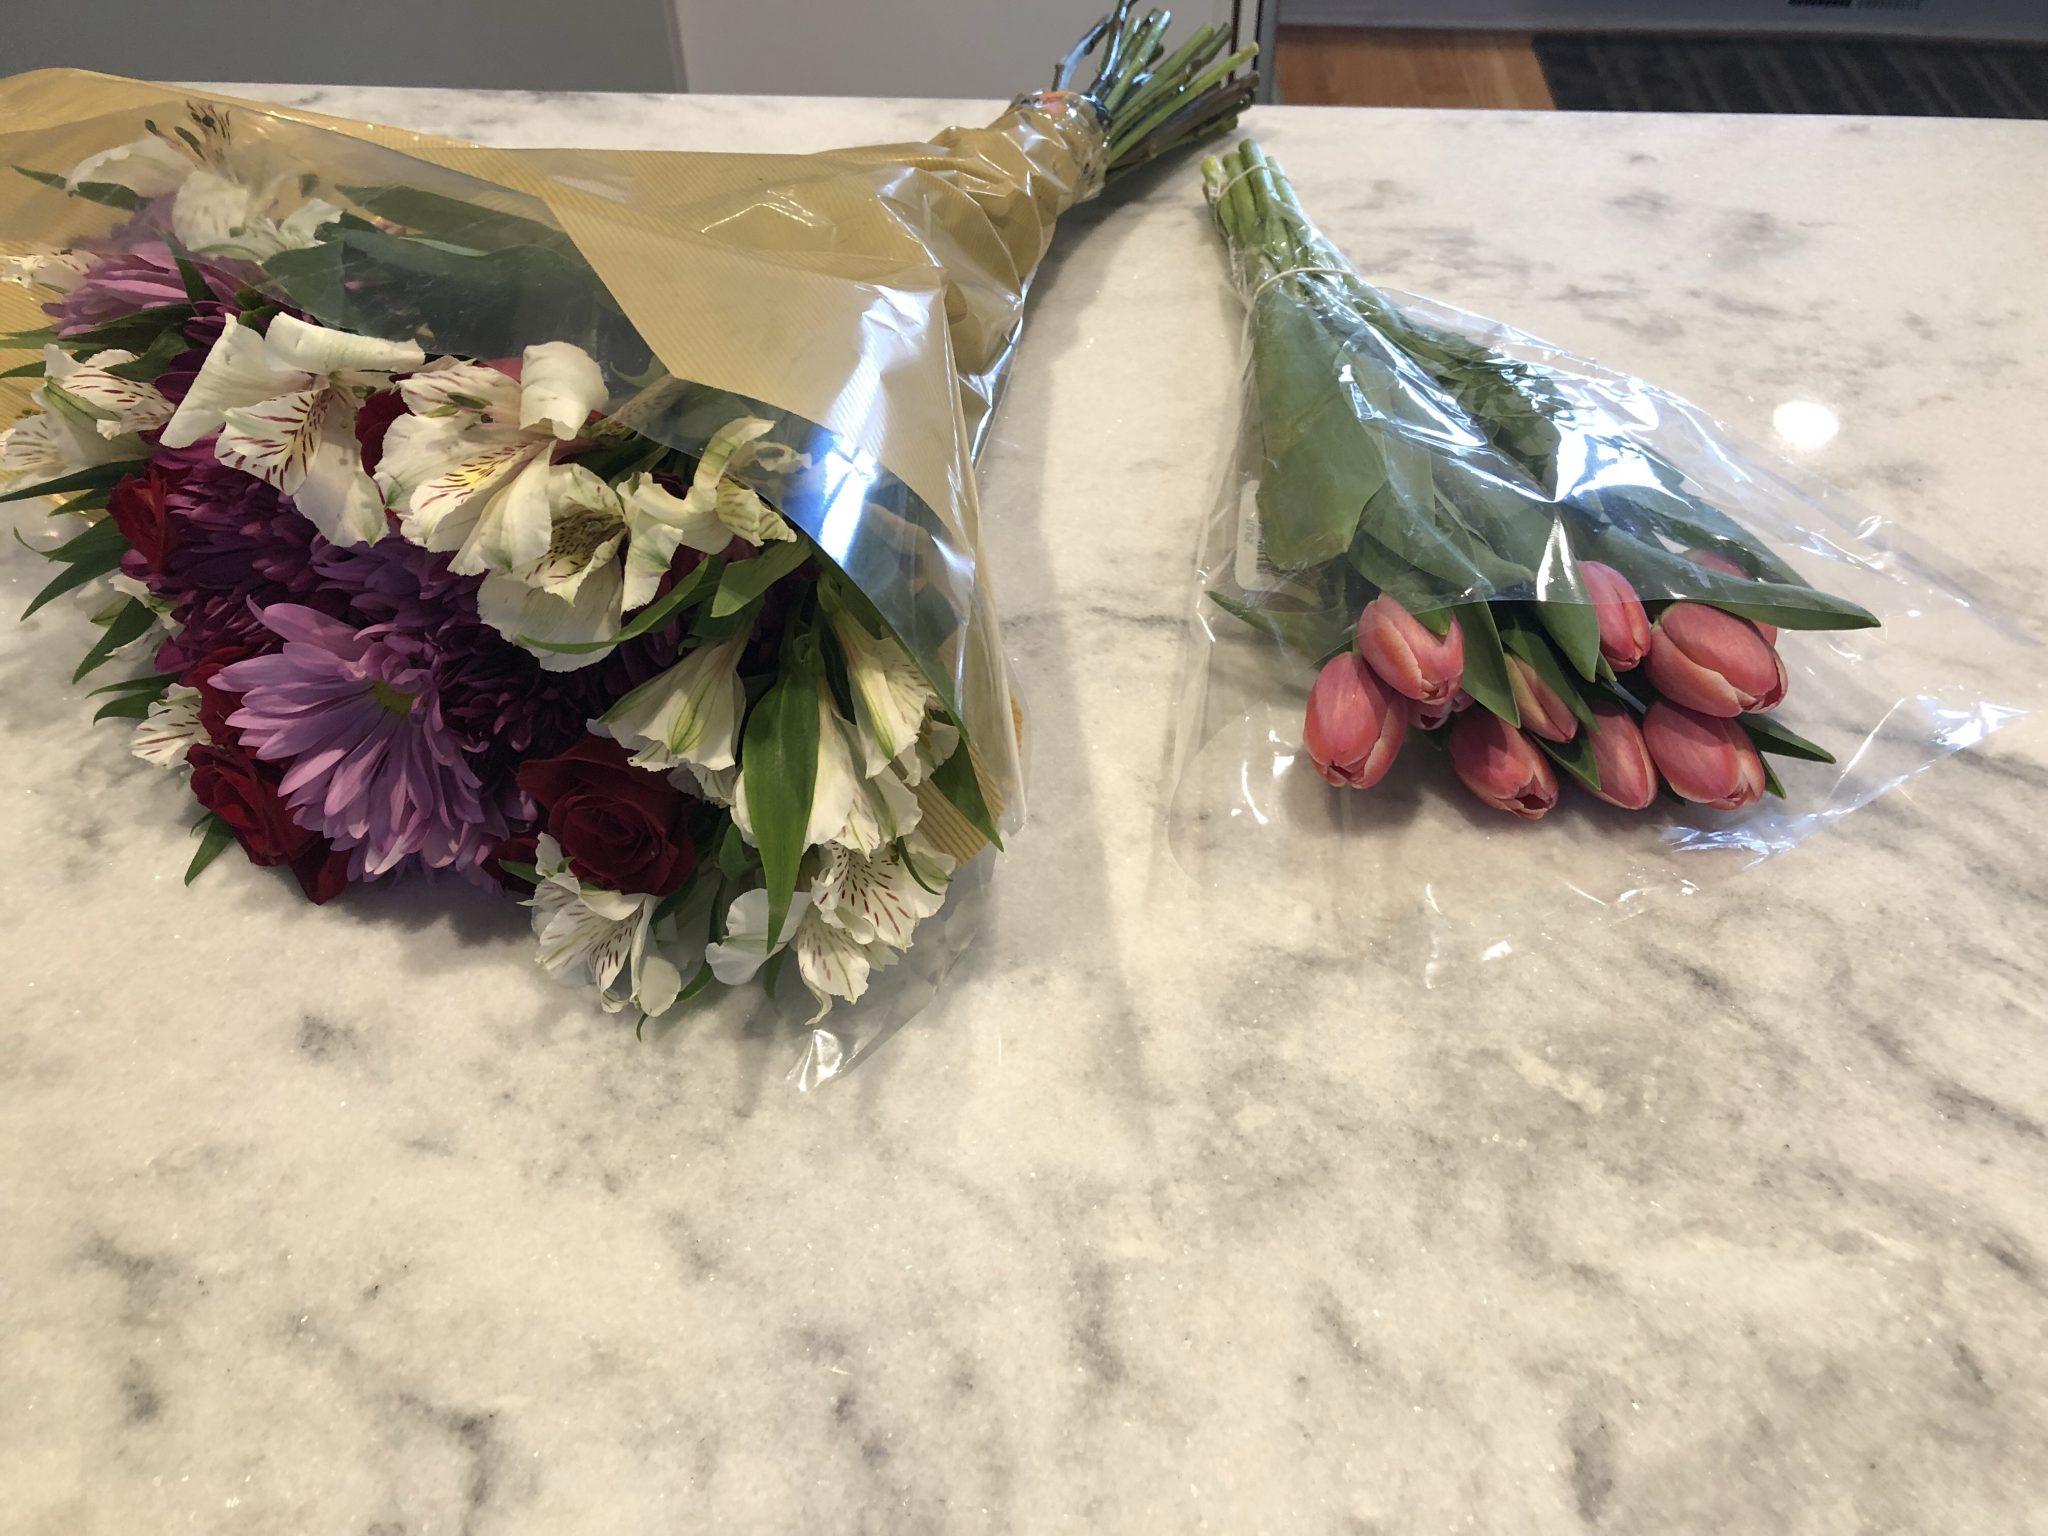 DIY Flower Bundle - making your own arrangement